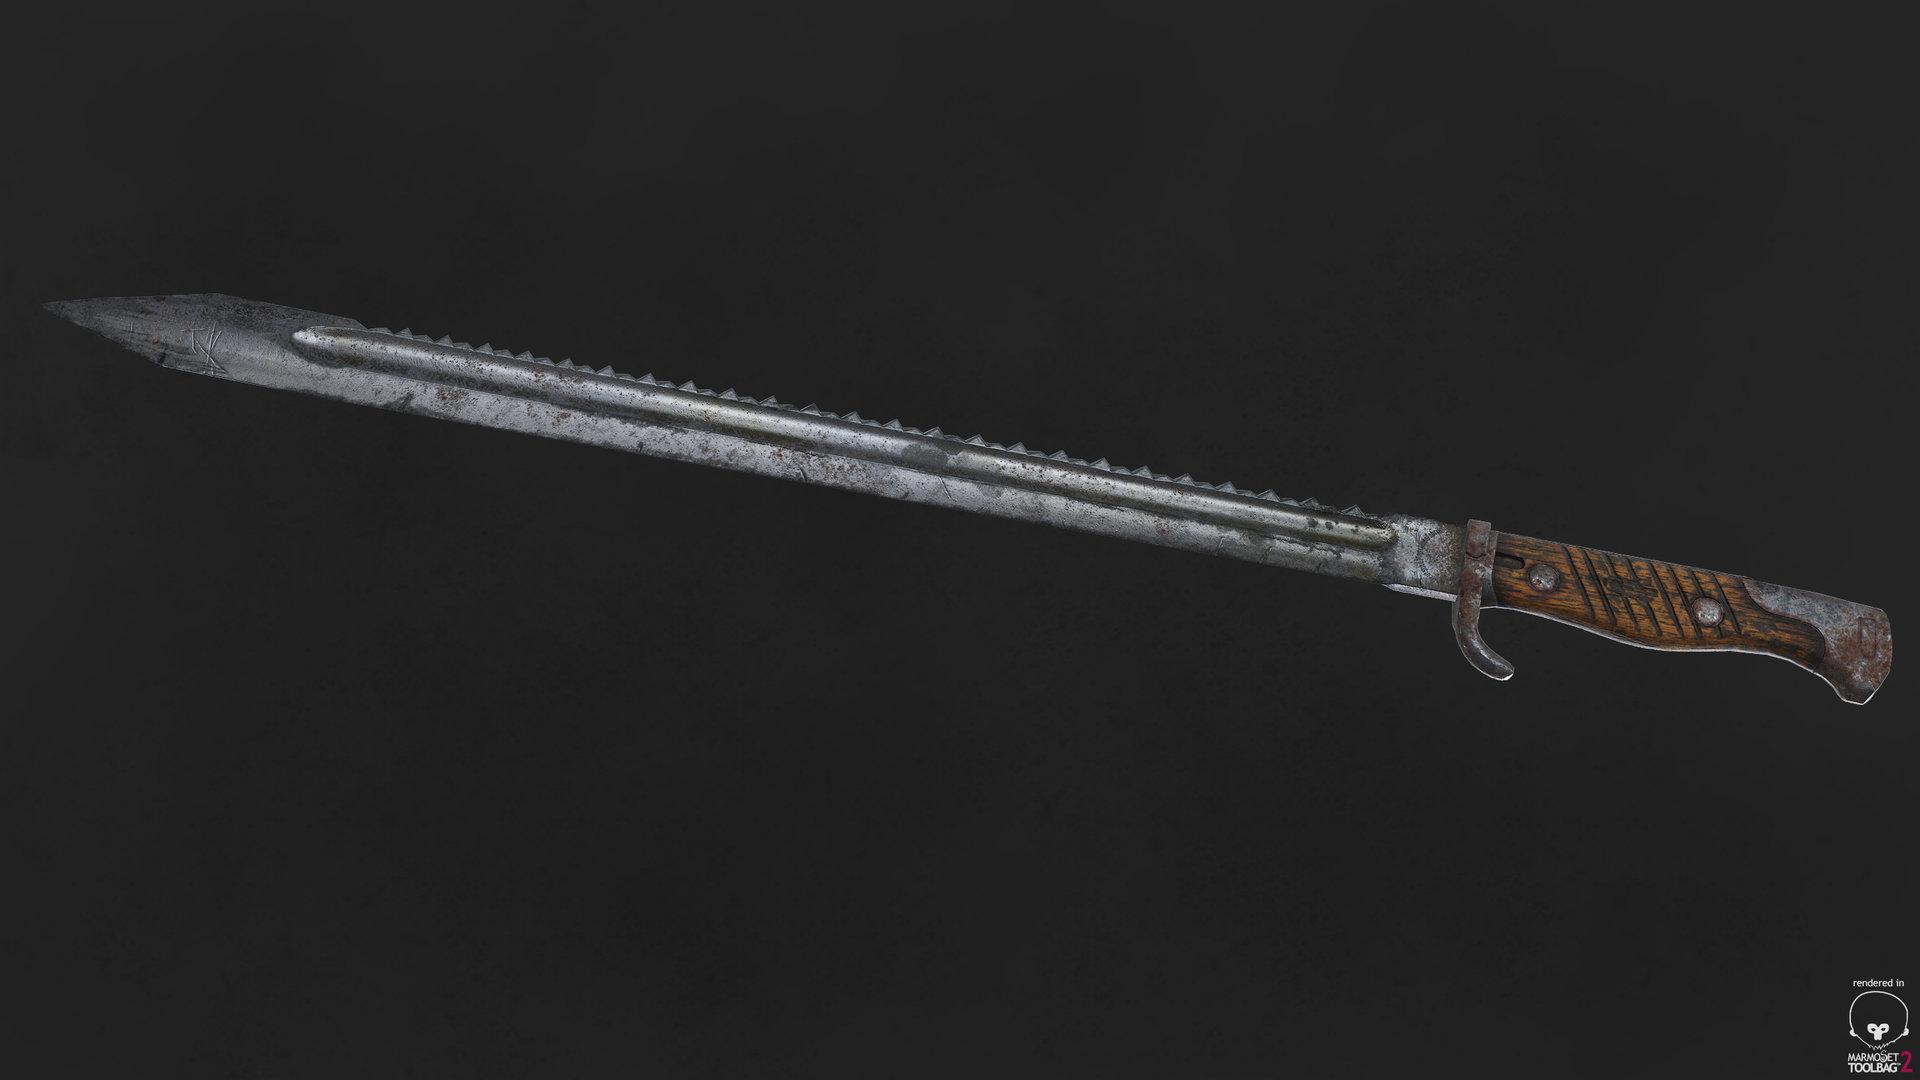 sebastian-schade-ww1-knife-03.jpg?1436831677